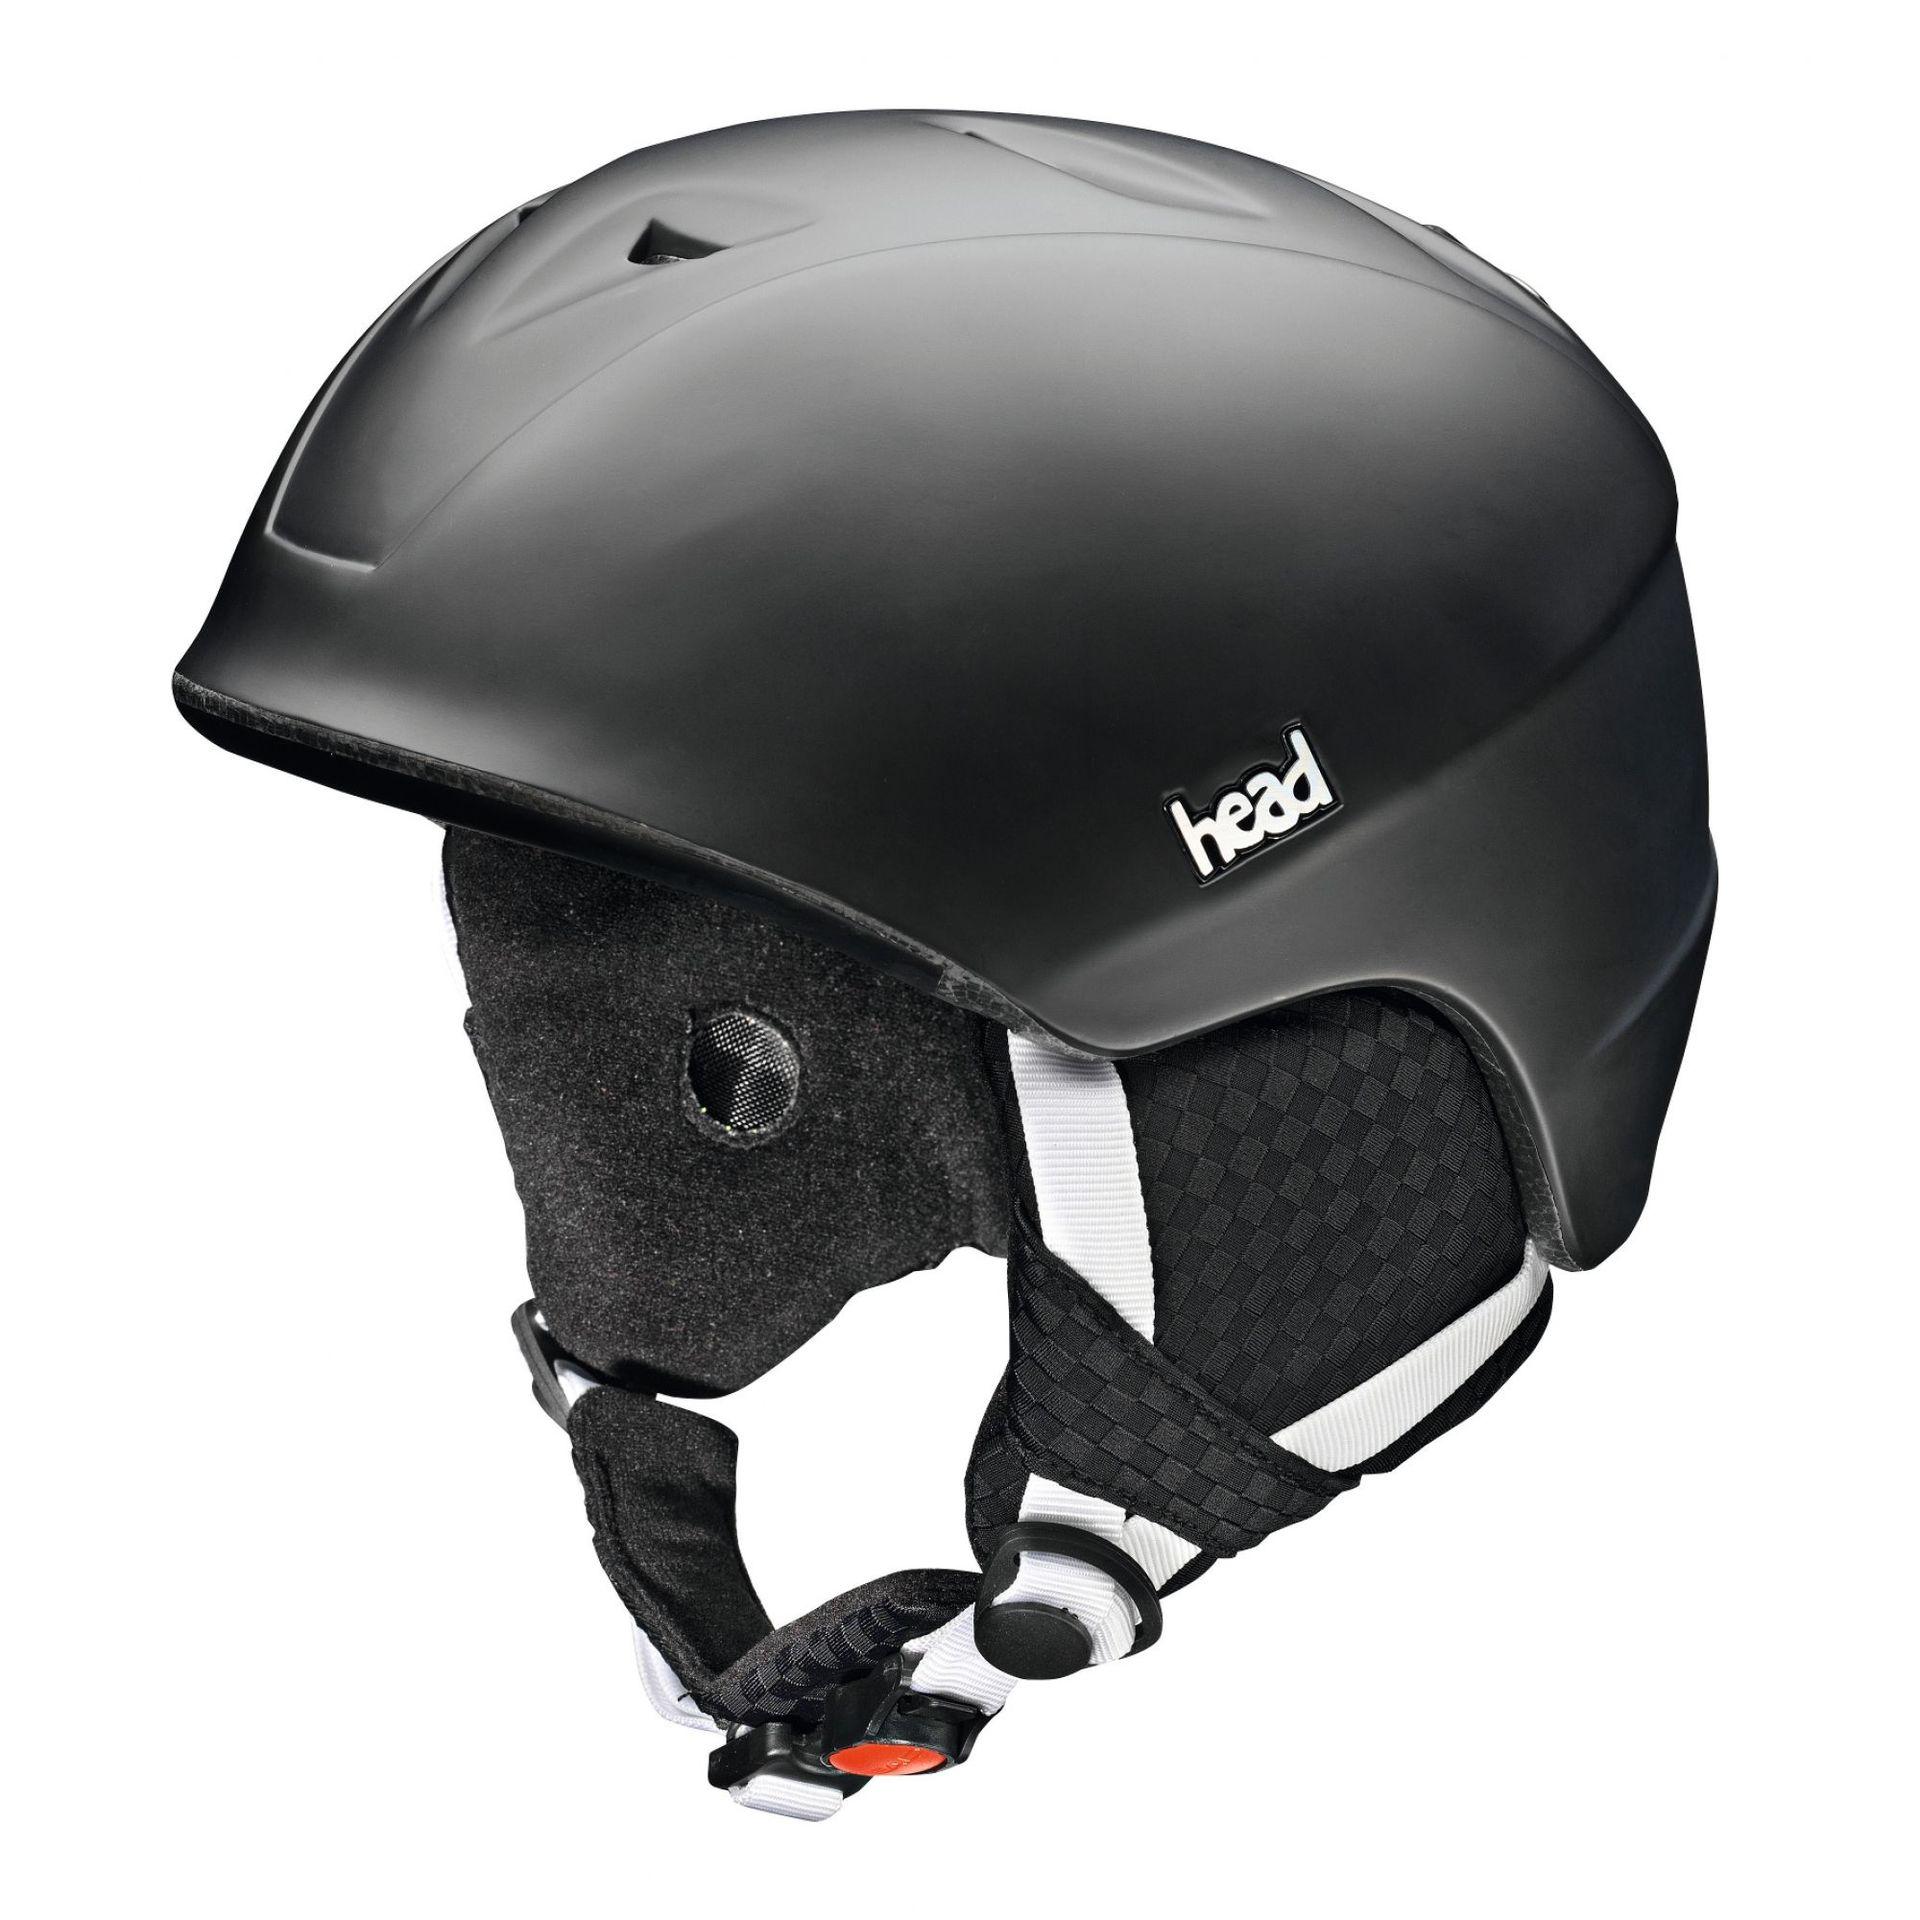 KASK HEAD REBEL BLACK 0